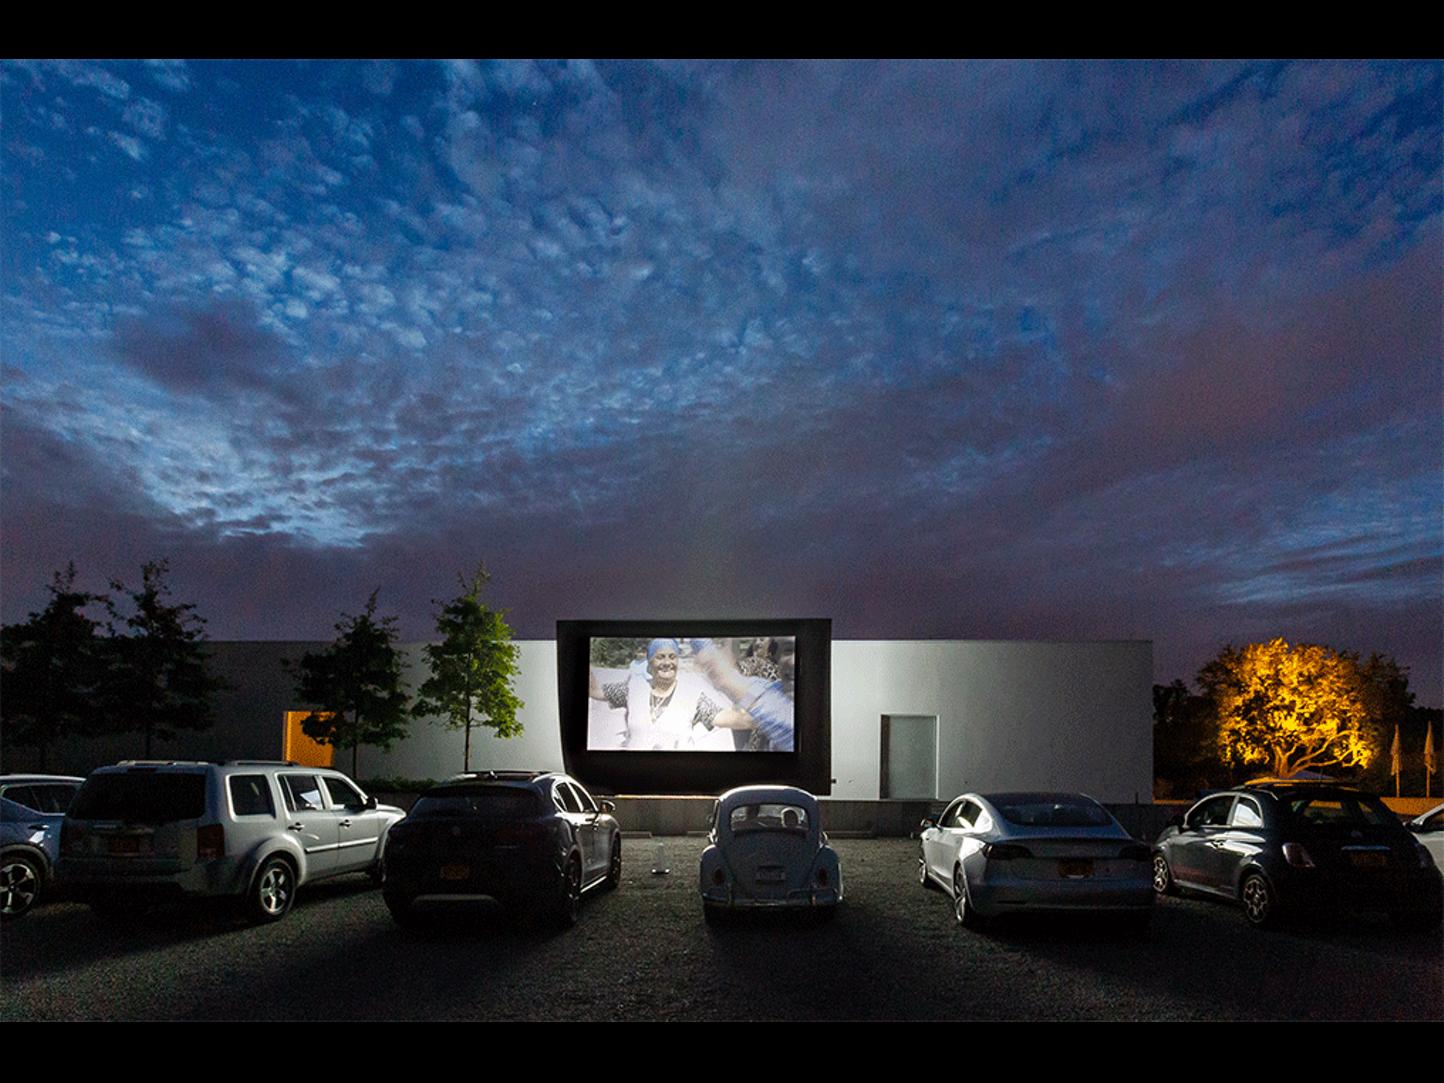 Pop Up Drive In Movie Experiences Film Hudson Valley Chronogram Magazine